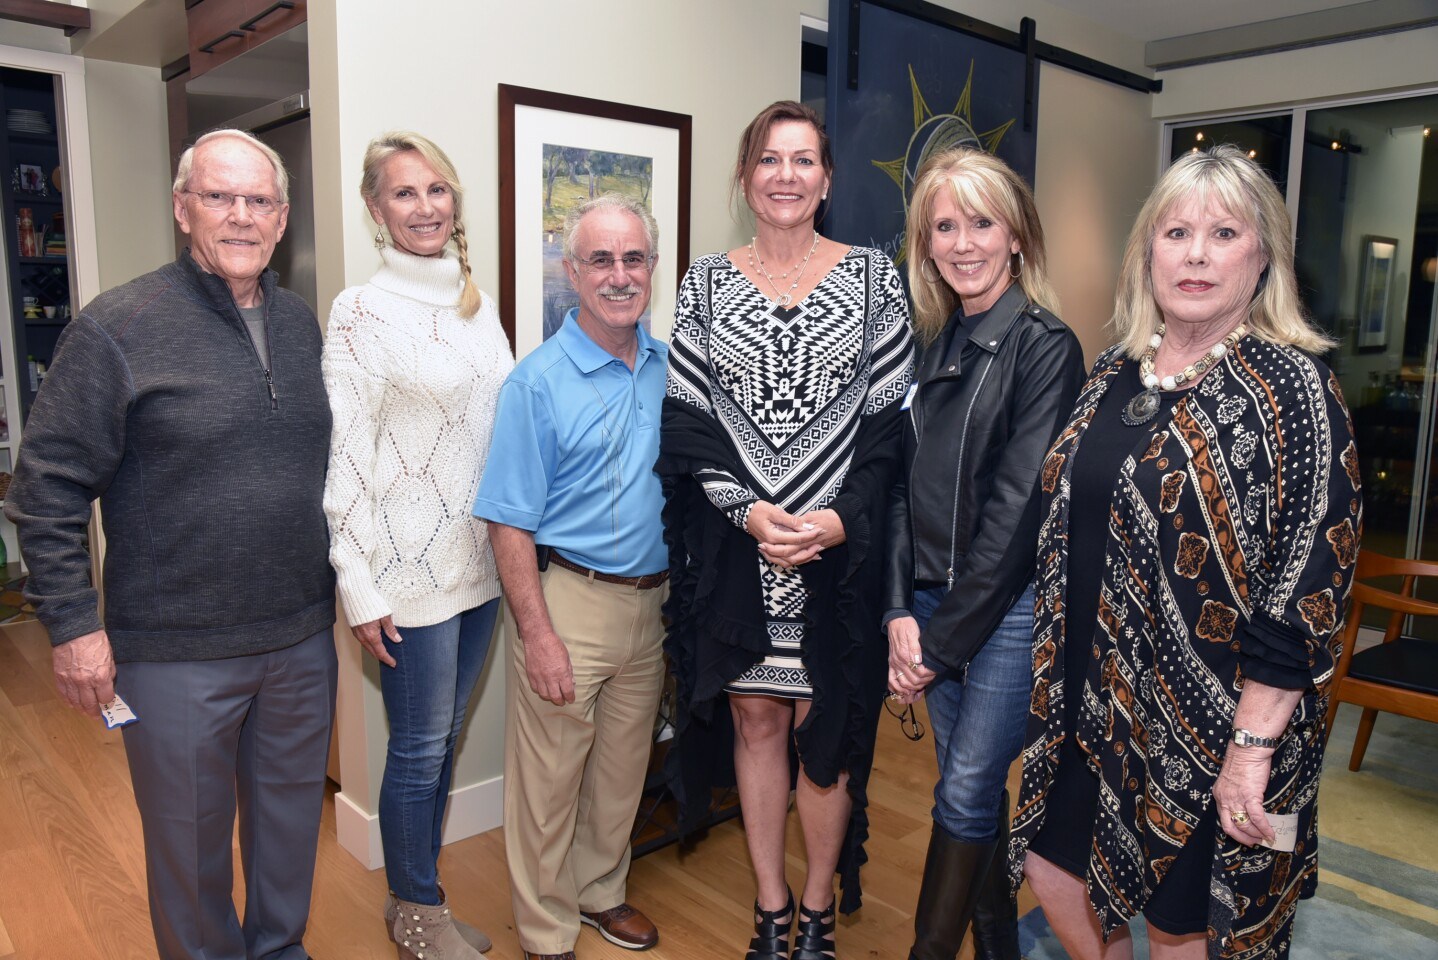 Bill Harman, host Andra Moran, Kerry Witkin, Sherry Yardley, Roz Mancinelli, Suzy MacGillivray